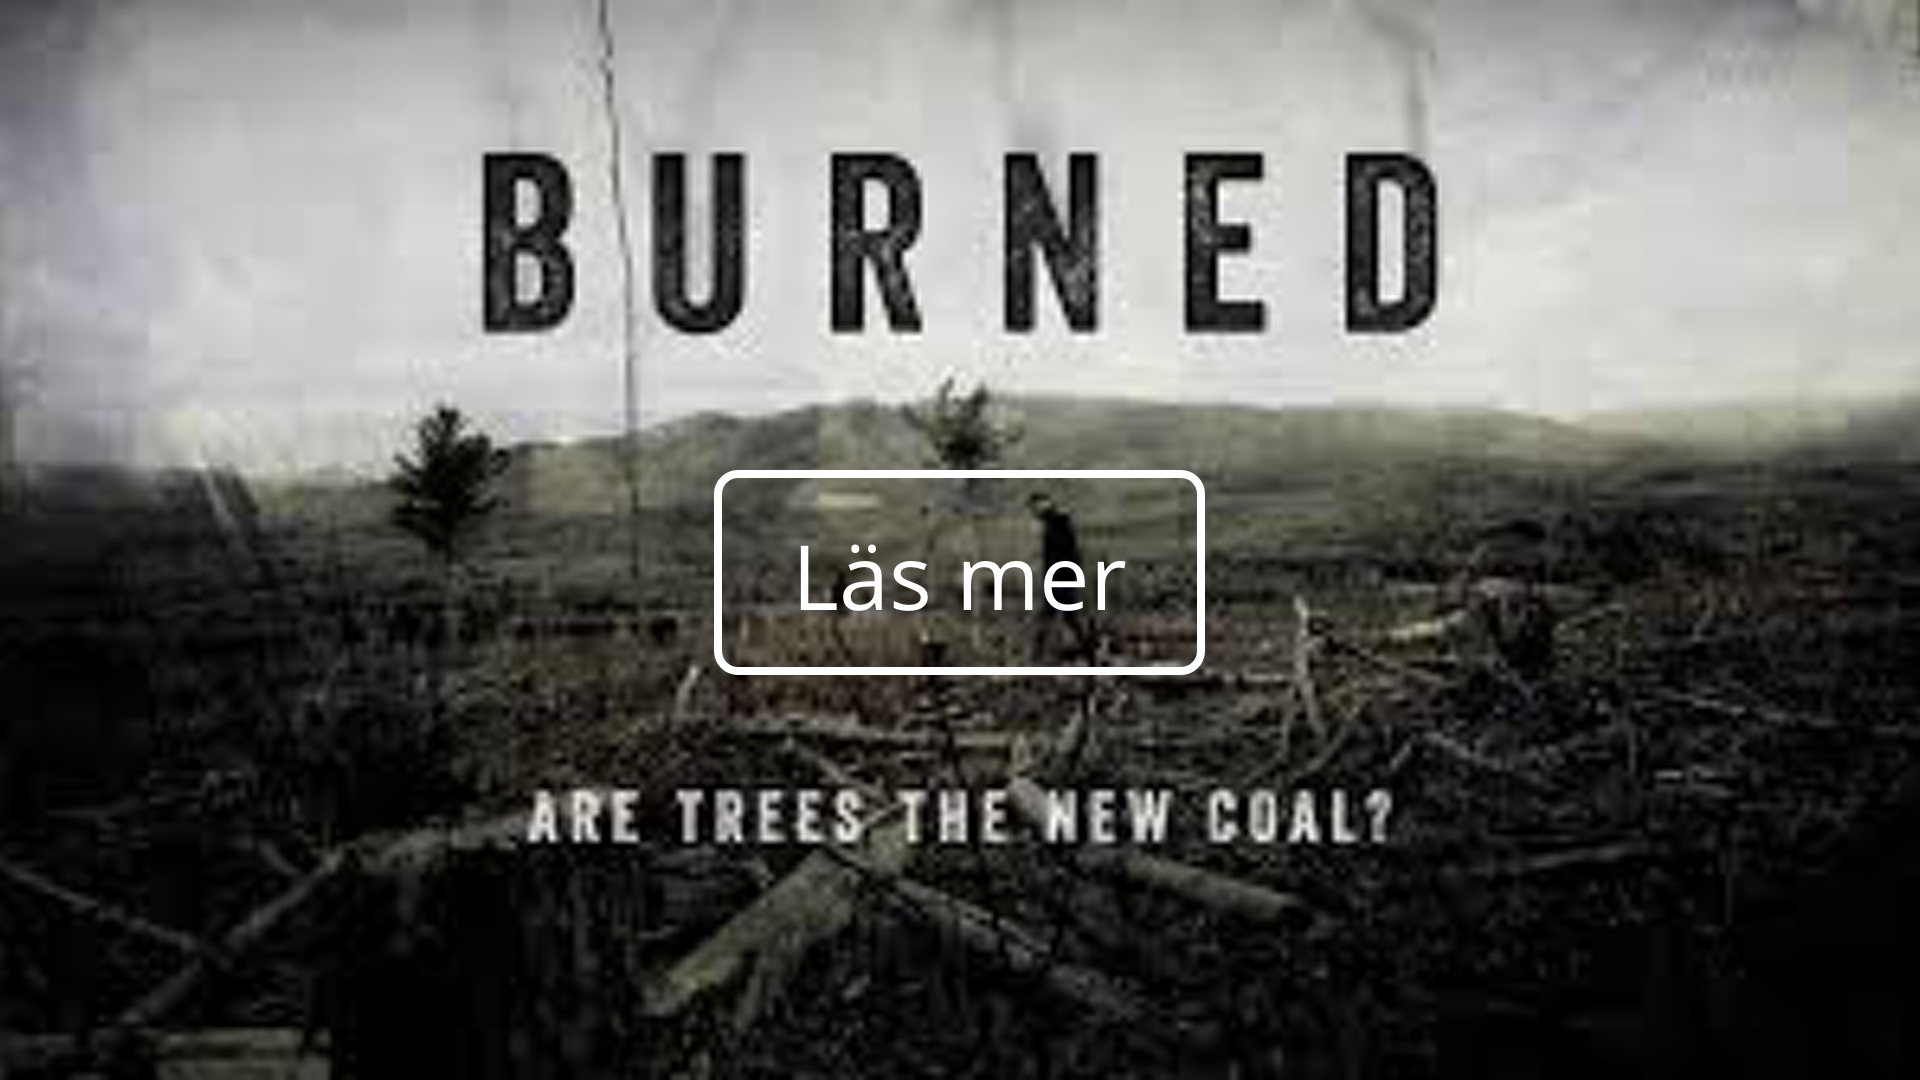 thefuture, resurs, Burned, Are Trees the new coal